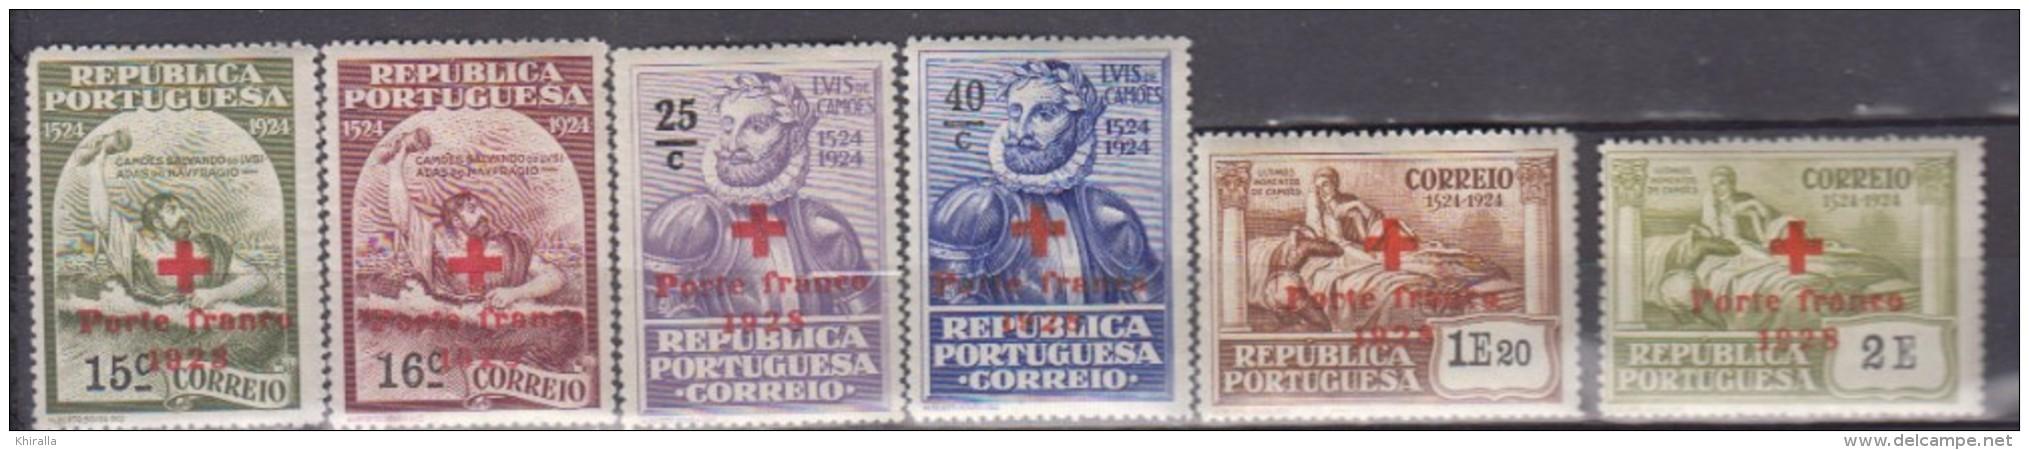 PORTUGAL    1928     Franchise     N.   32 / 37   COTE    7 . 50  EUROS          ( M 191 ) - Franchise